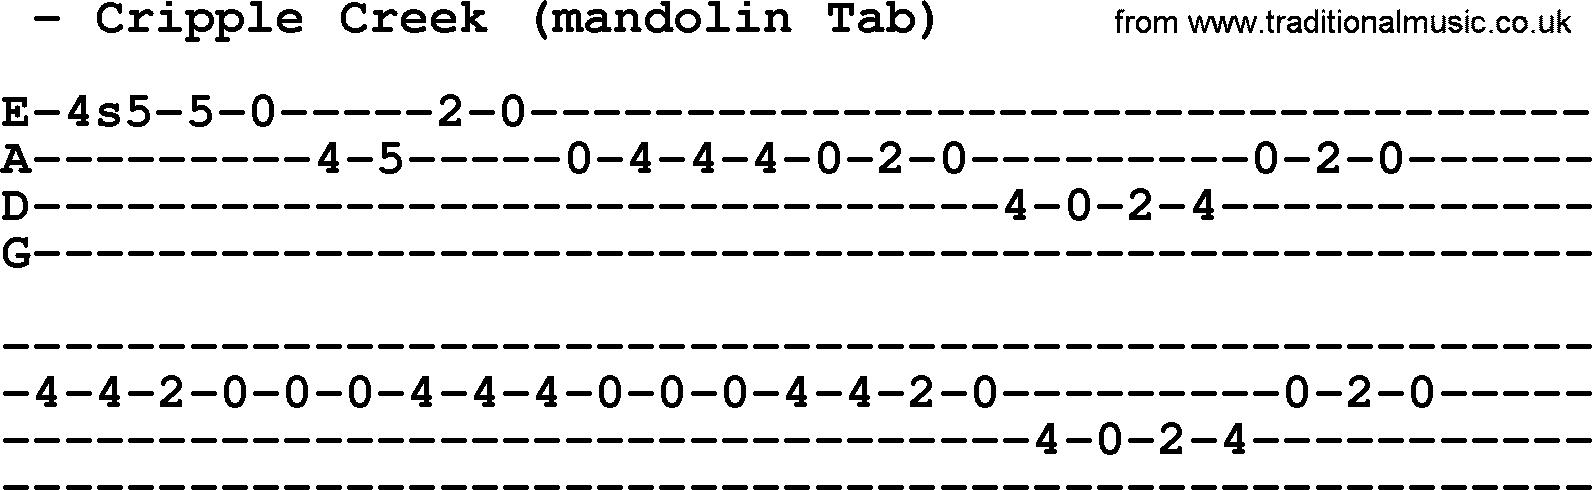 Lyric bluegrass song lyrics : Cripple Creek(Mandolin Tab) - Bluegrass lyrics with chords